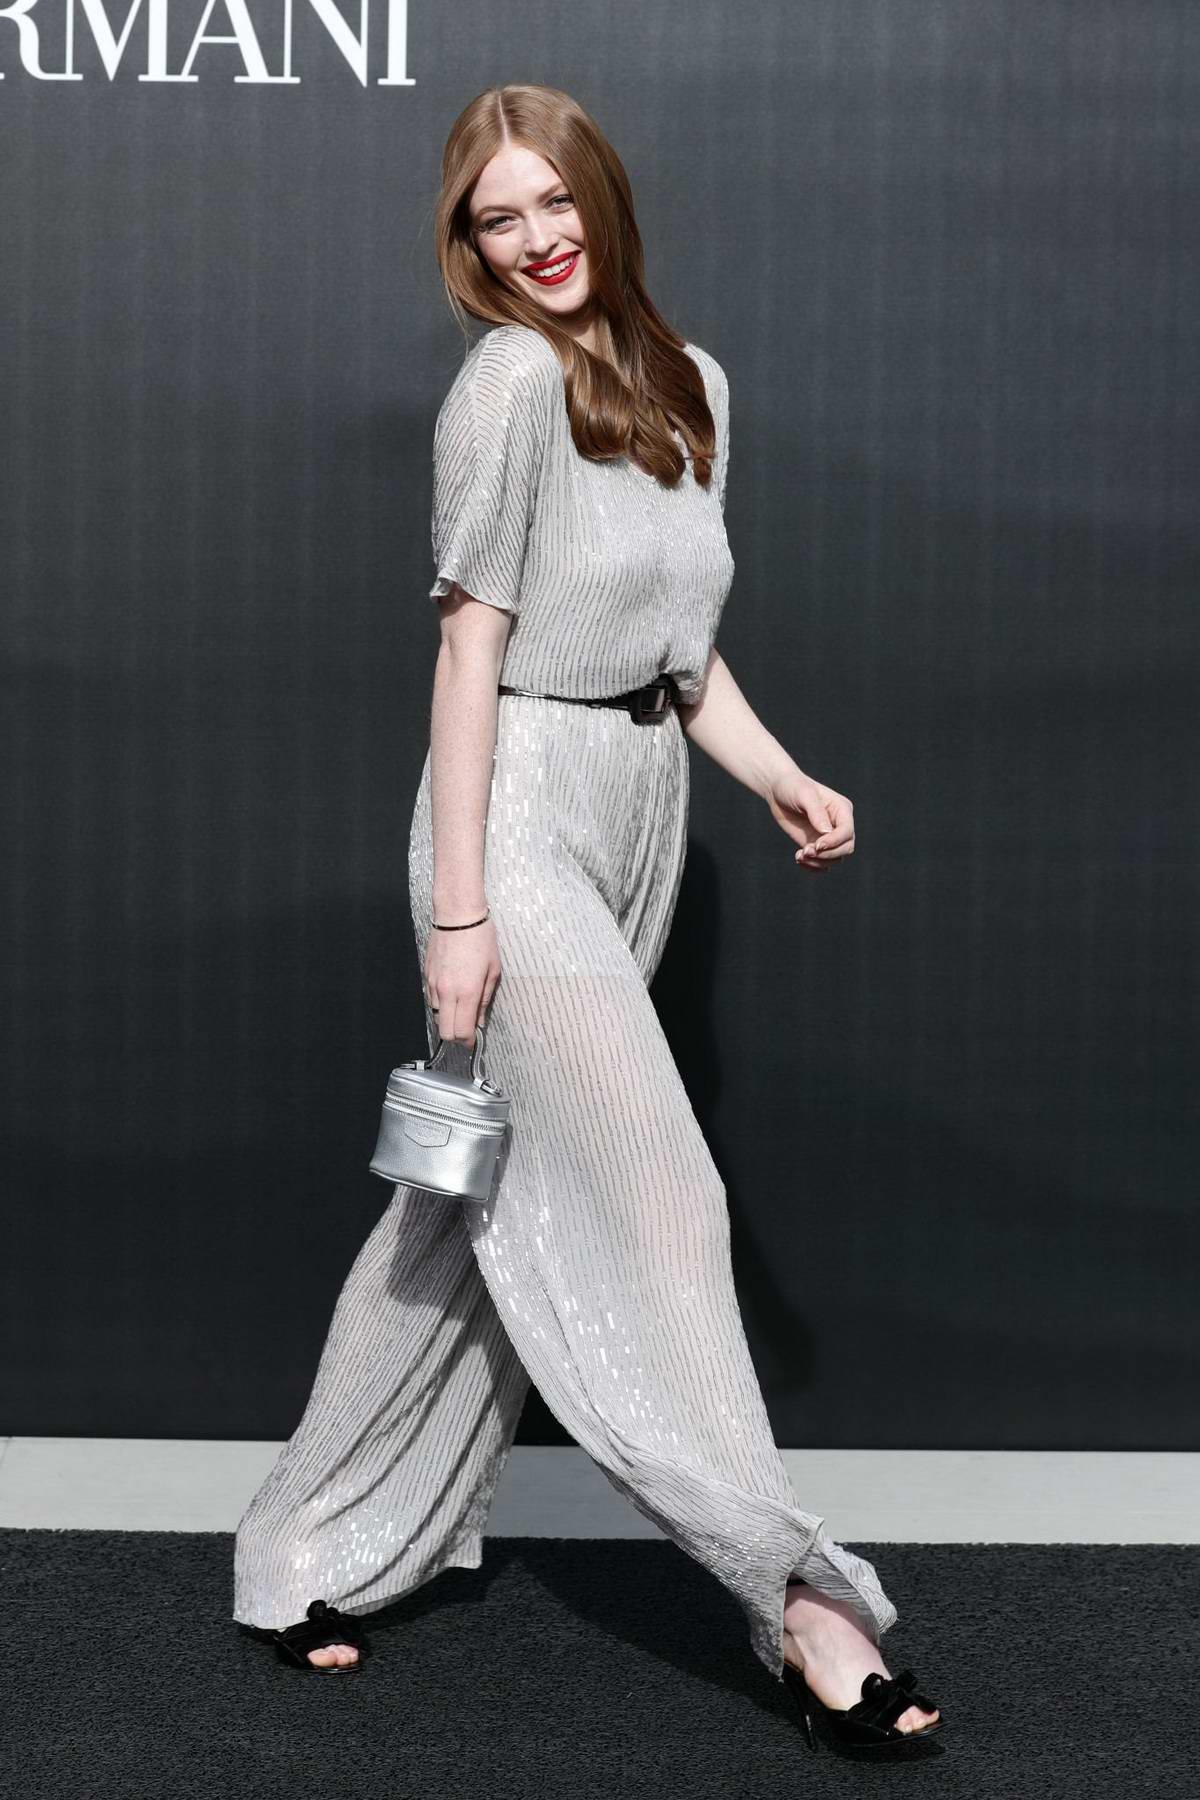 Larsen Thompson attends the Emporio Armani fashion show, F/W 2020 during Milan Fashion Week in Milan, Italy